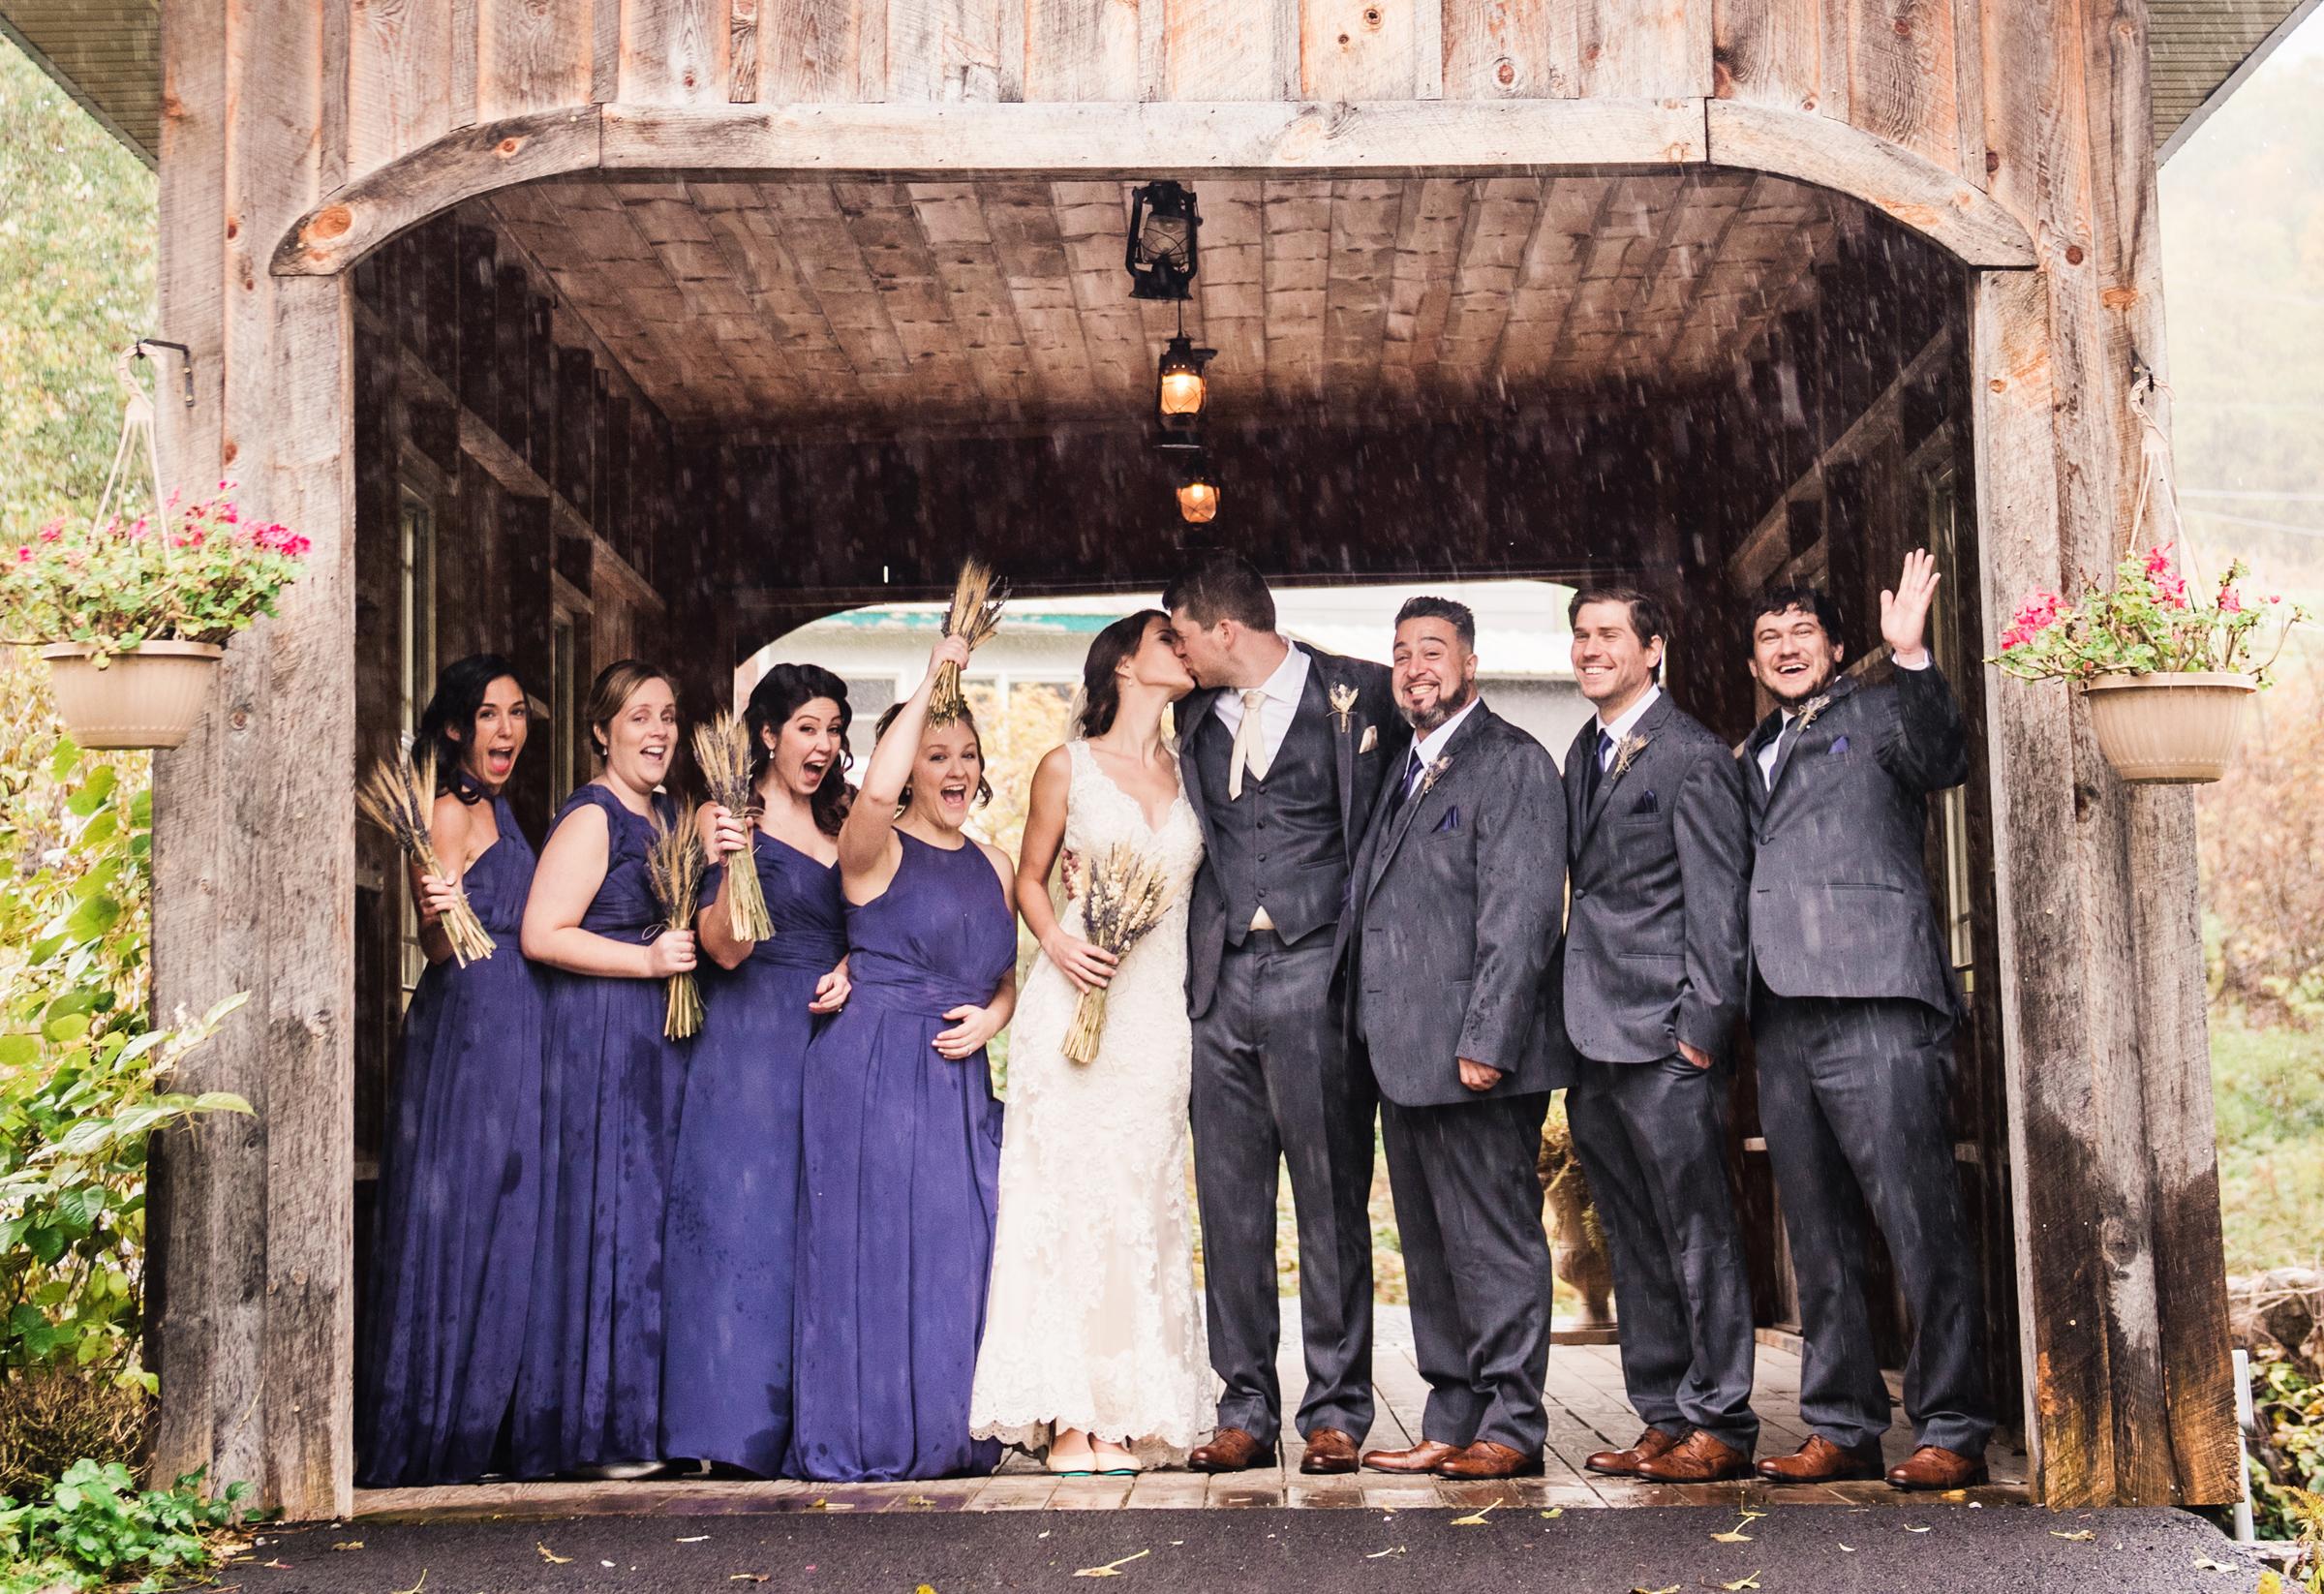 Wolf_Oak_Acres_Central_NY_Wedding_JILL_STUDIO_Rochester_NY_Photographer_DSC_7449.jpg